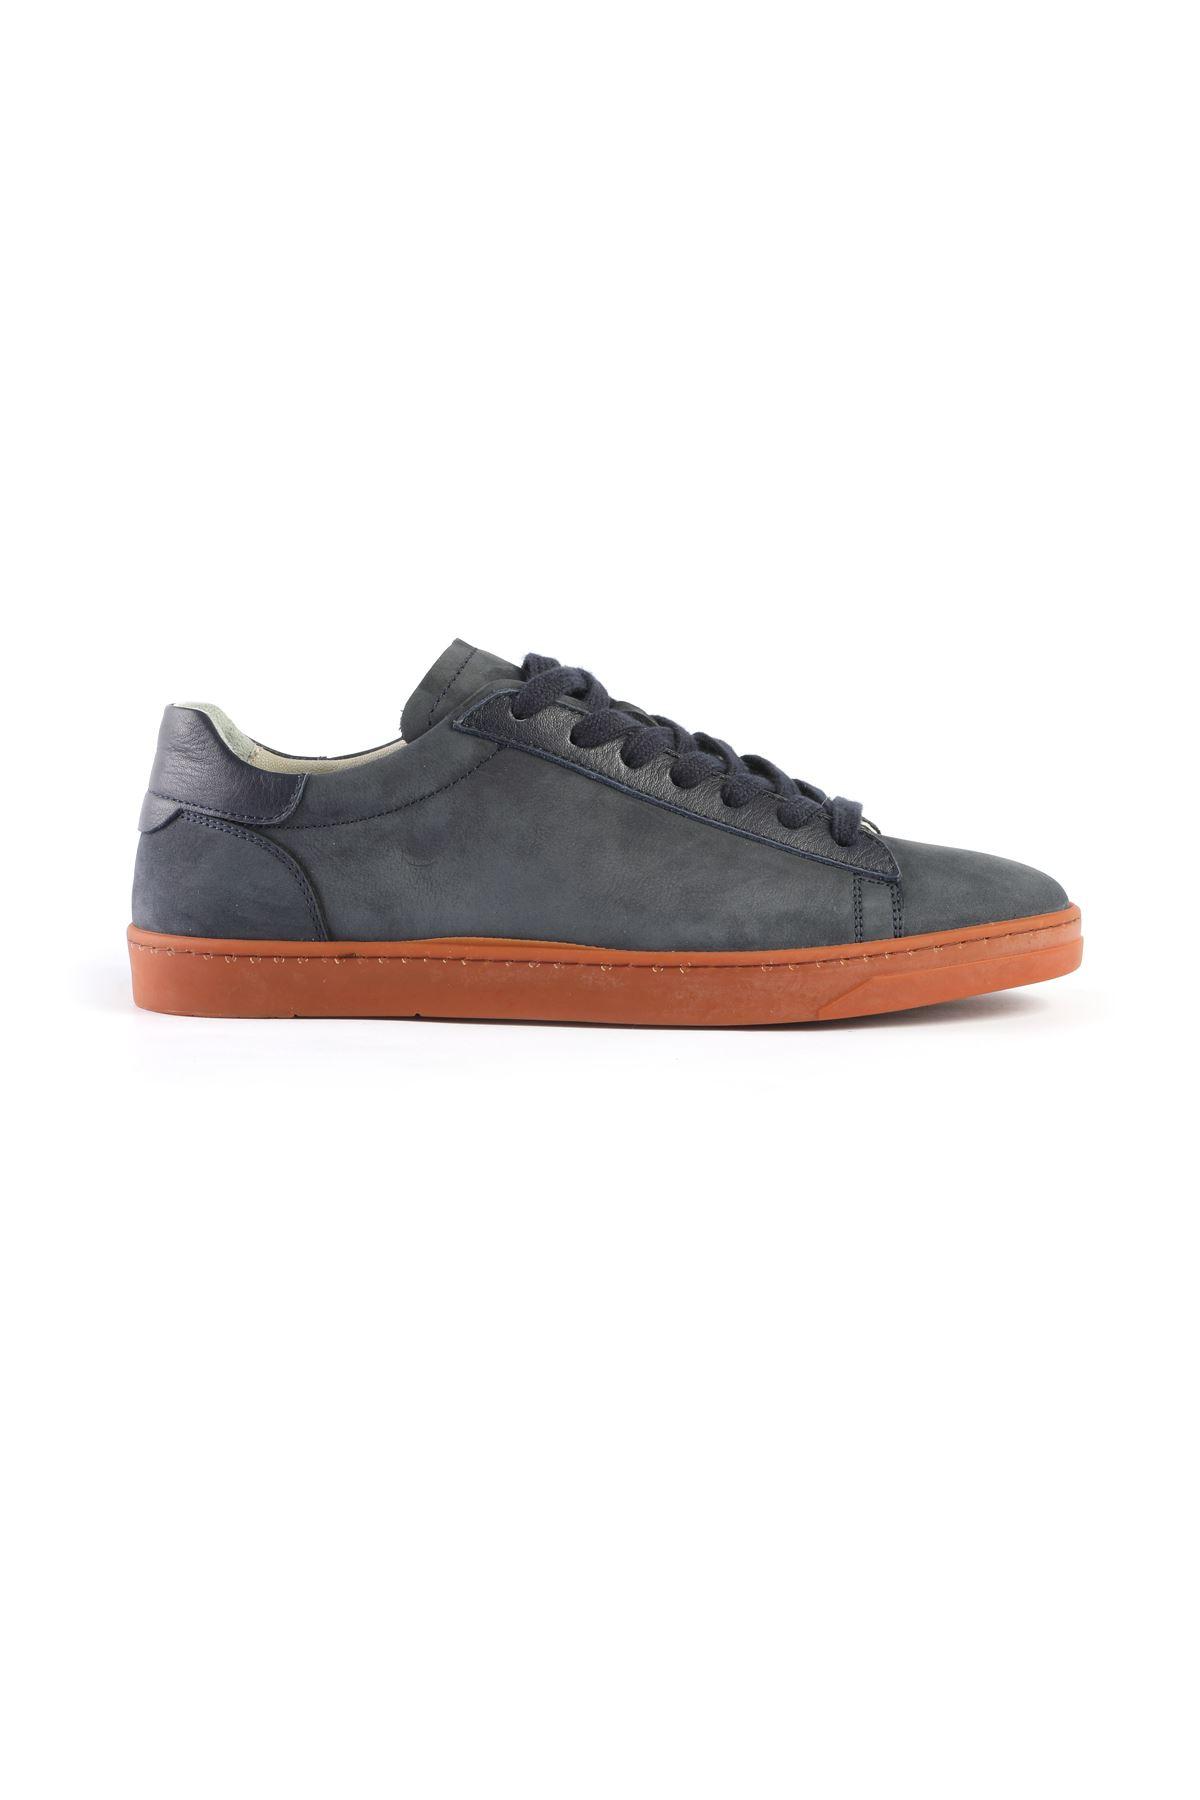 Libero L3419 Navy Blue Casual Shoes